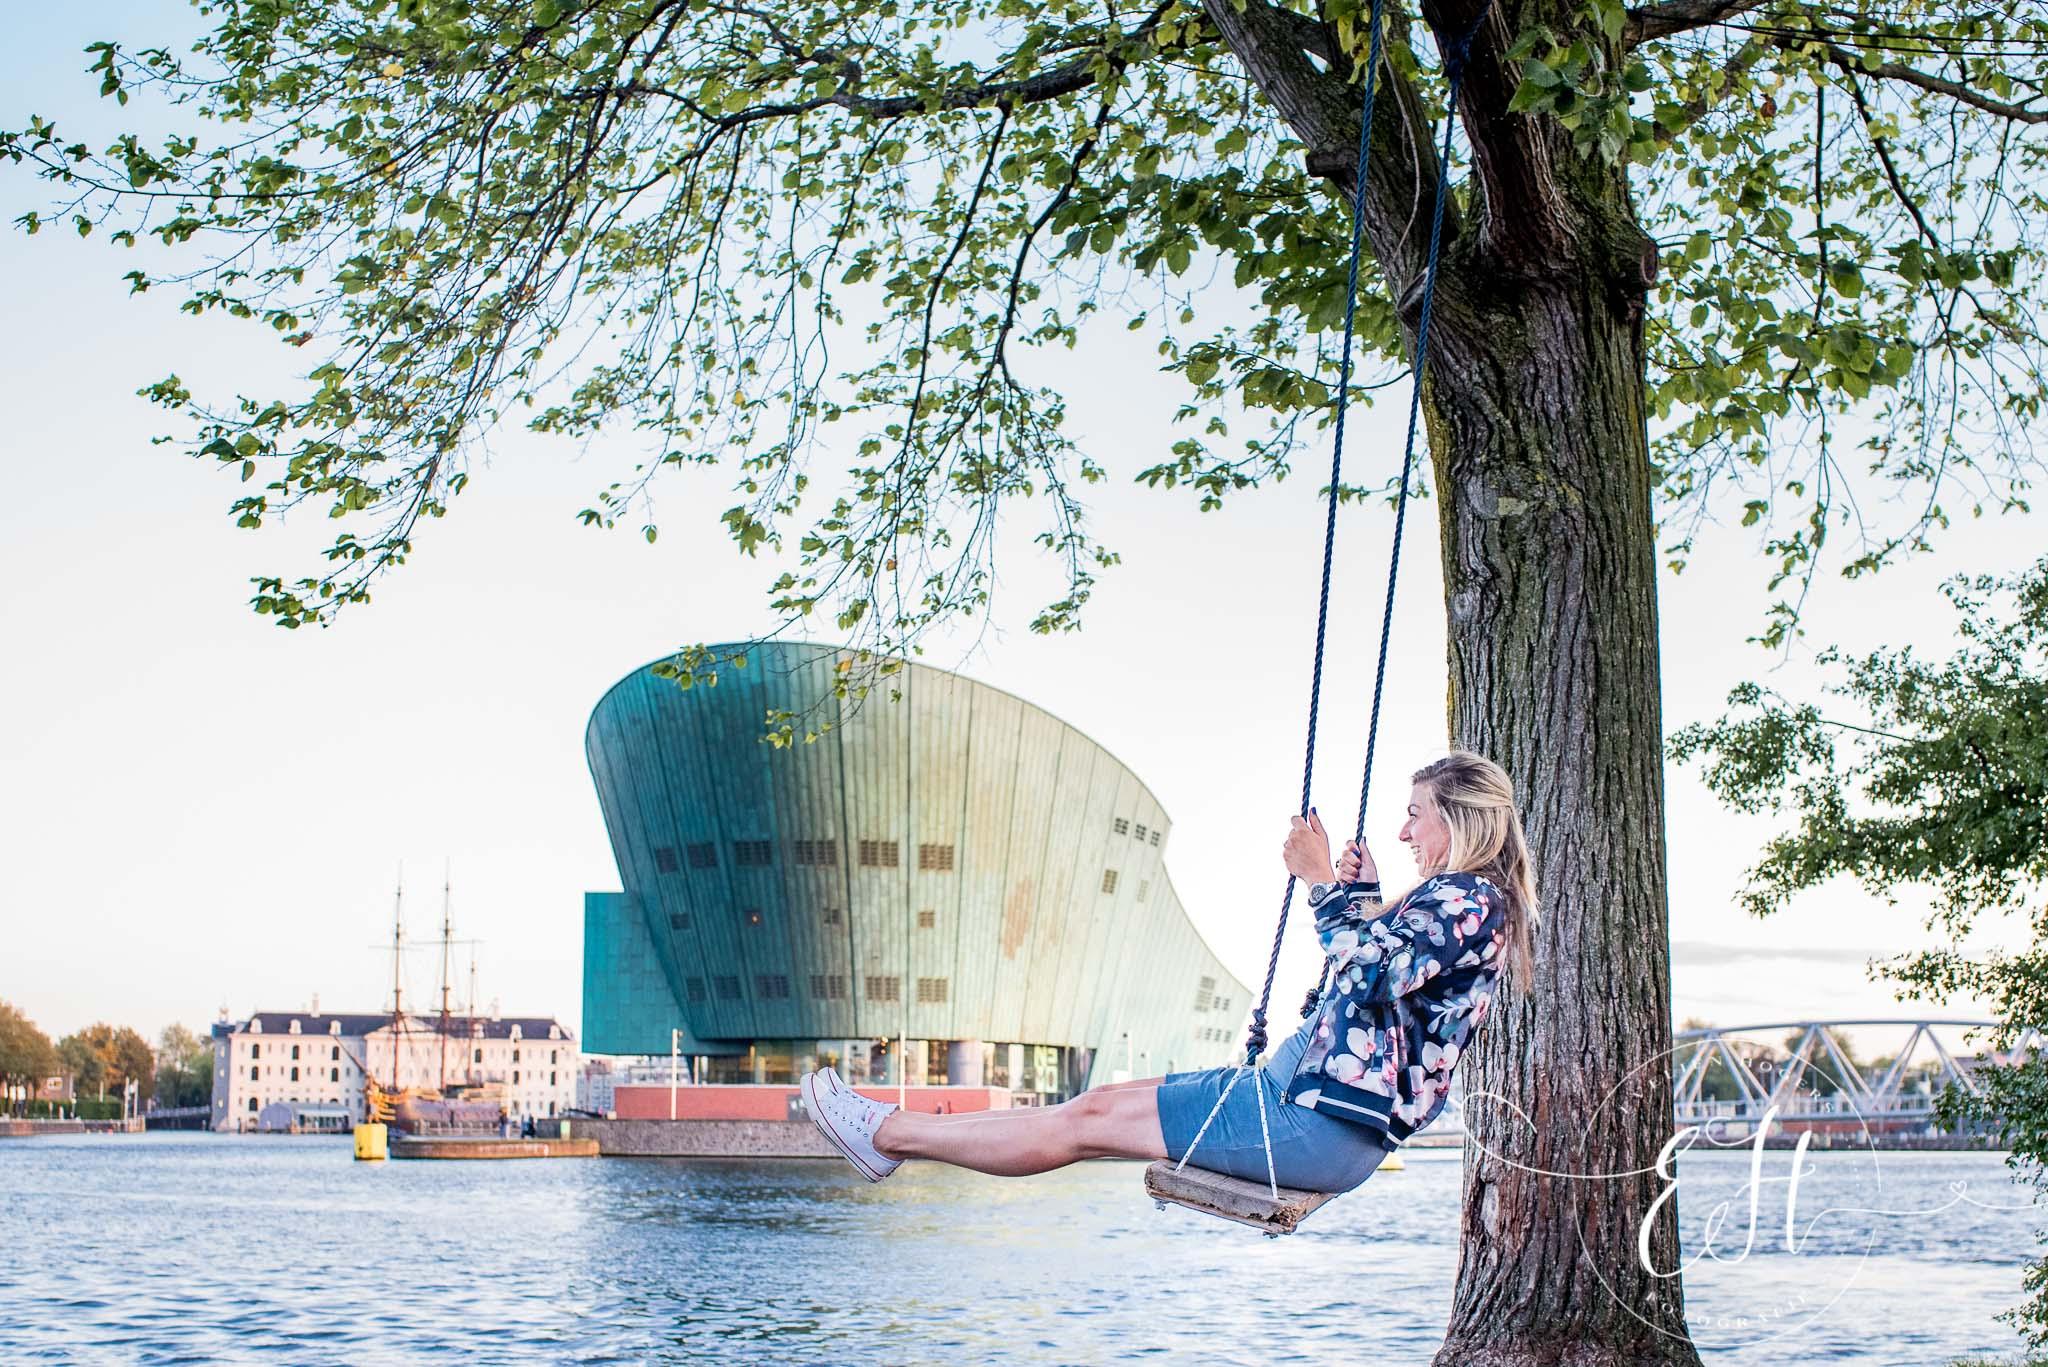 loveshoot-in-amsterdam-evelien-hogers-fotografie (10 van 26).jpg